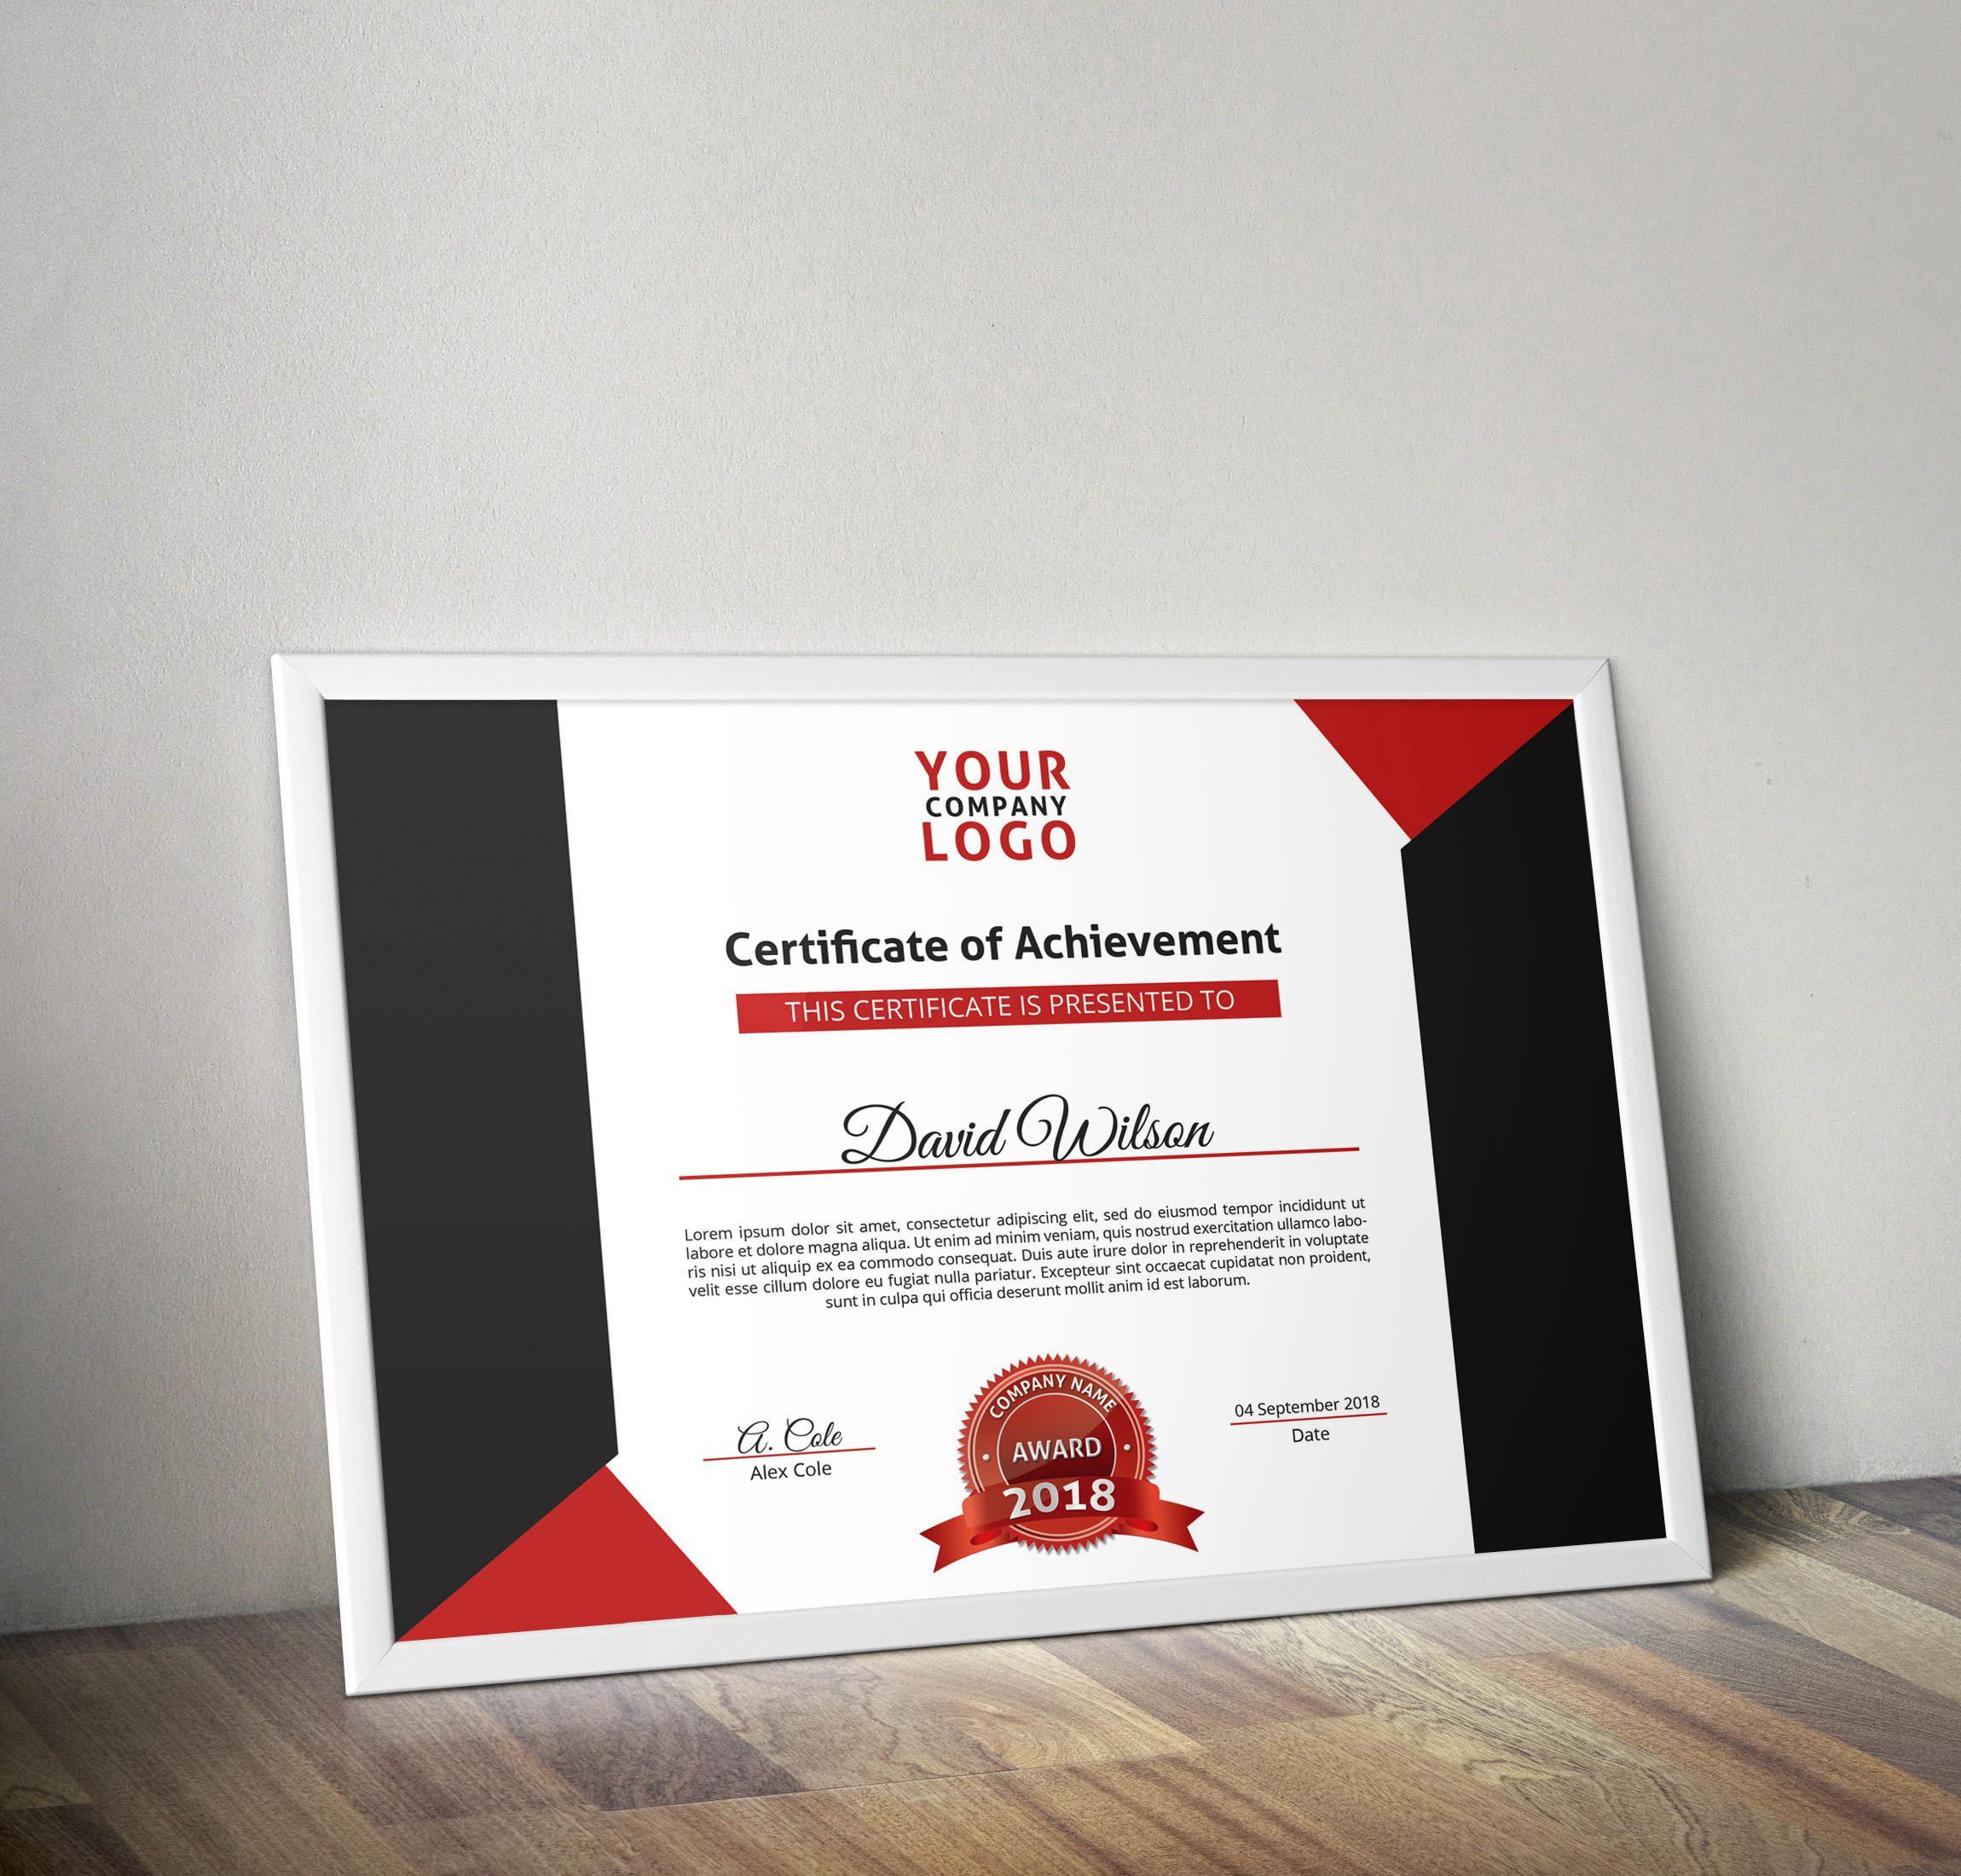 Multipurpose certificate psd template certificate template multipurpose certificate psd template certificate template certificate of achievement certificate of appreciation yadclub Images